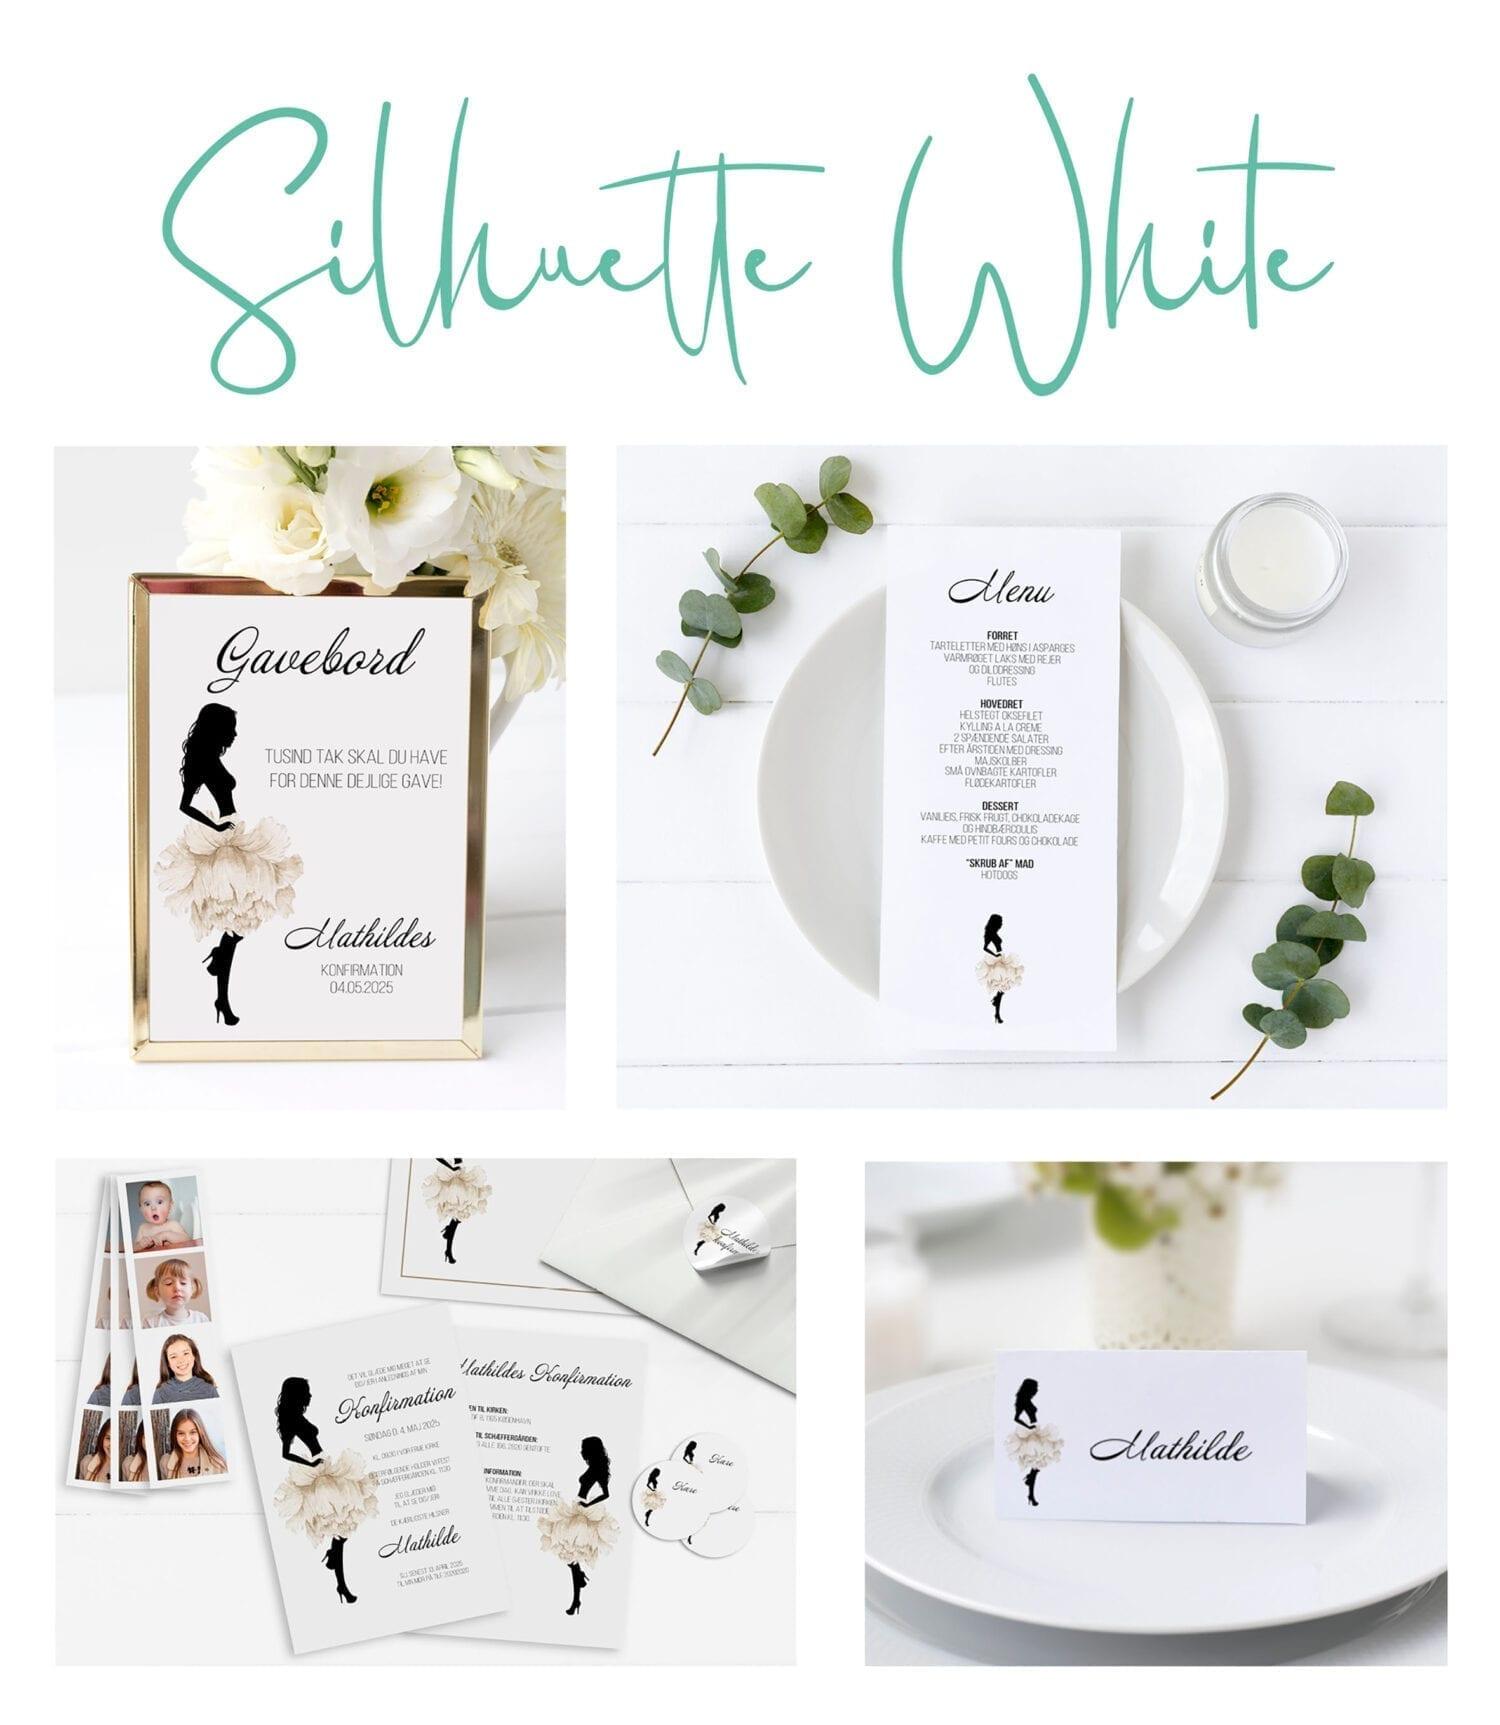 Silhuette White